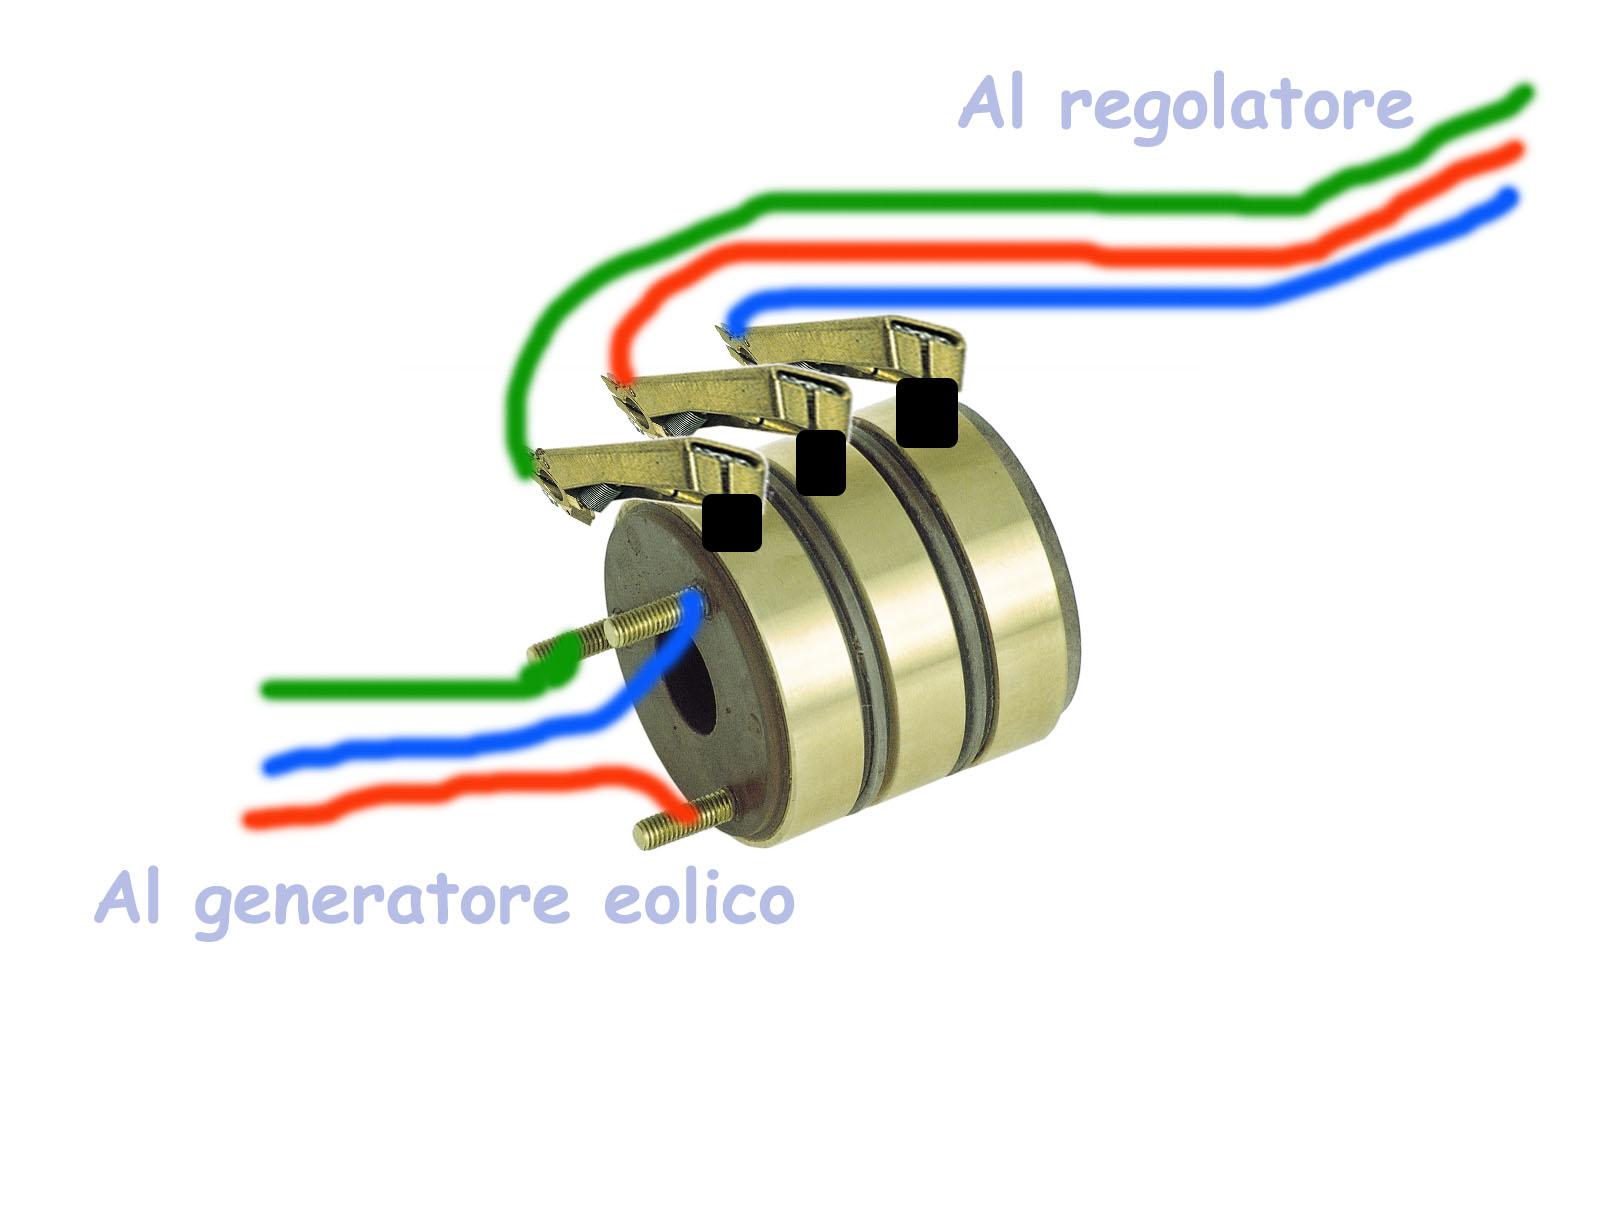 http://www.energialternativa.info/public/newforum/ForumEA/U/Contatti%20rotanti%20schema.jpg